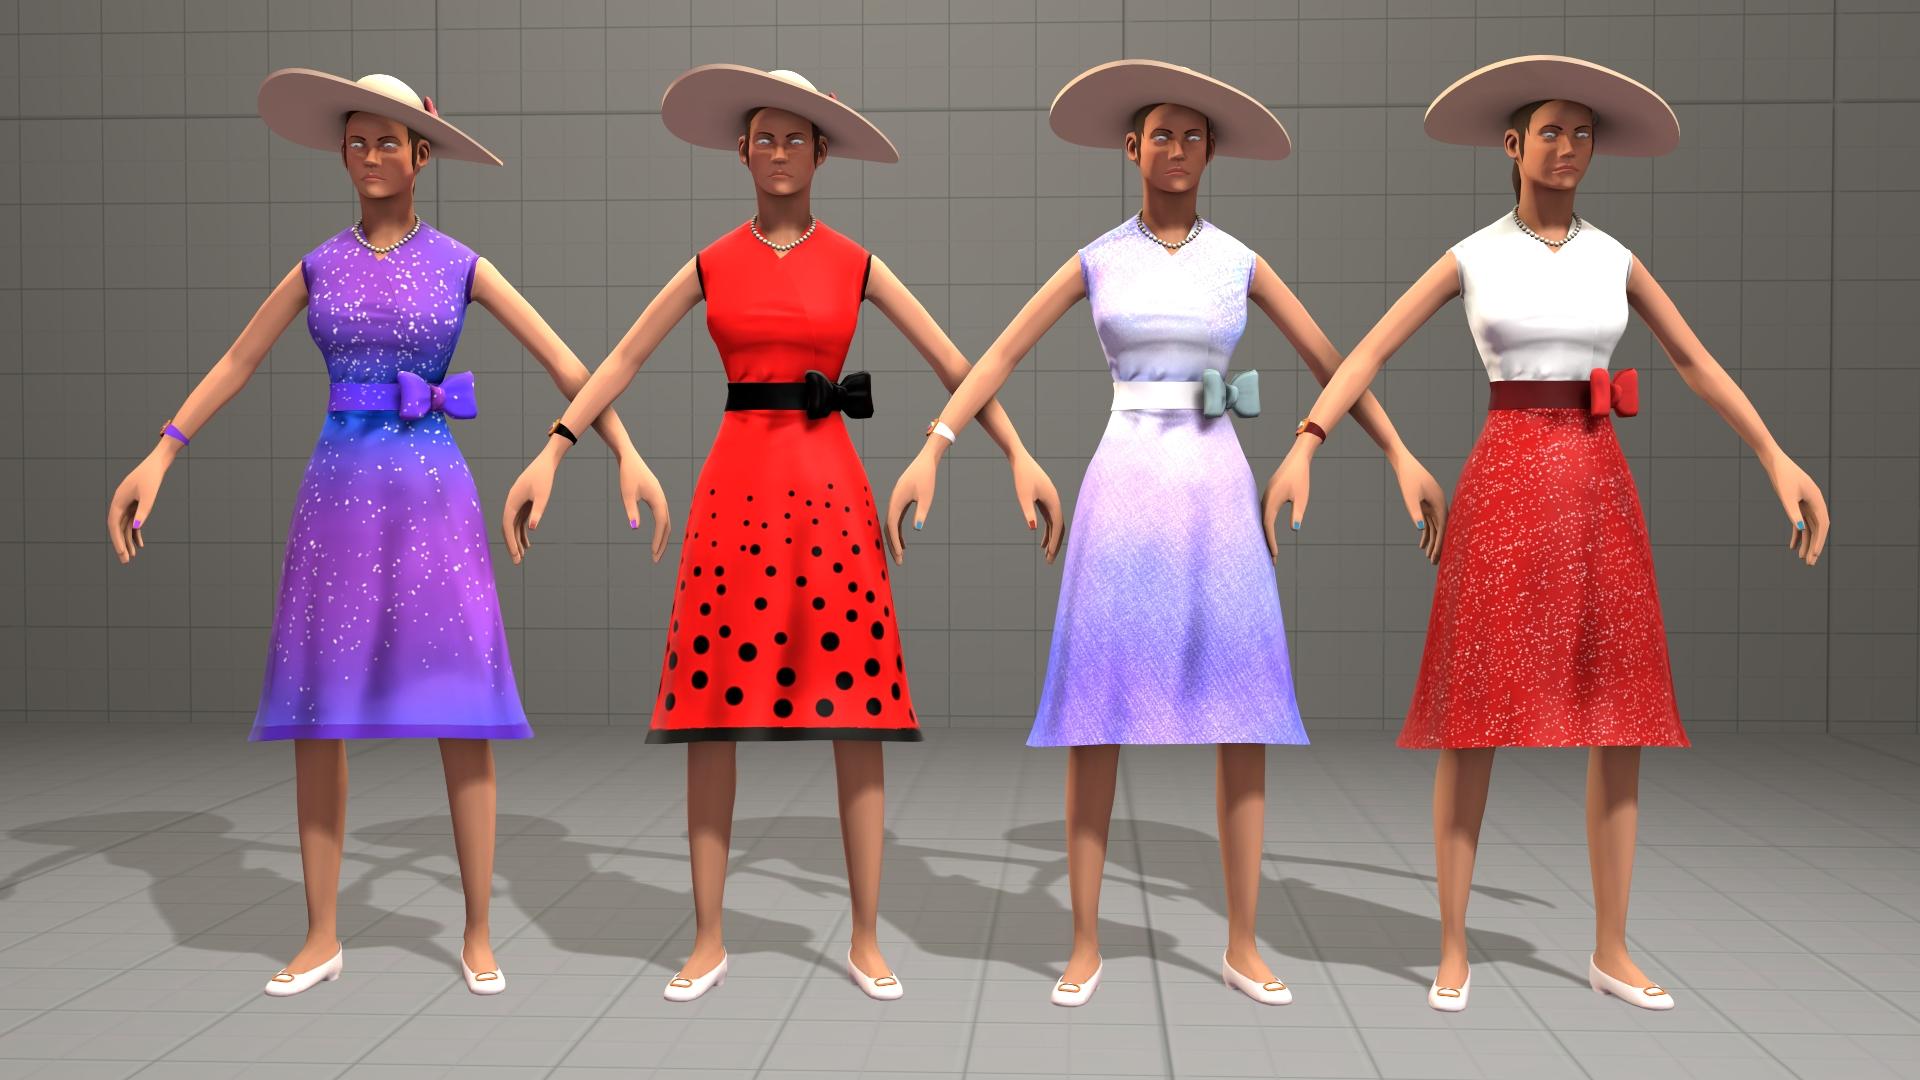 Femscout Dresses [SFM] [DL] by Nikolad92